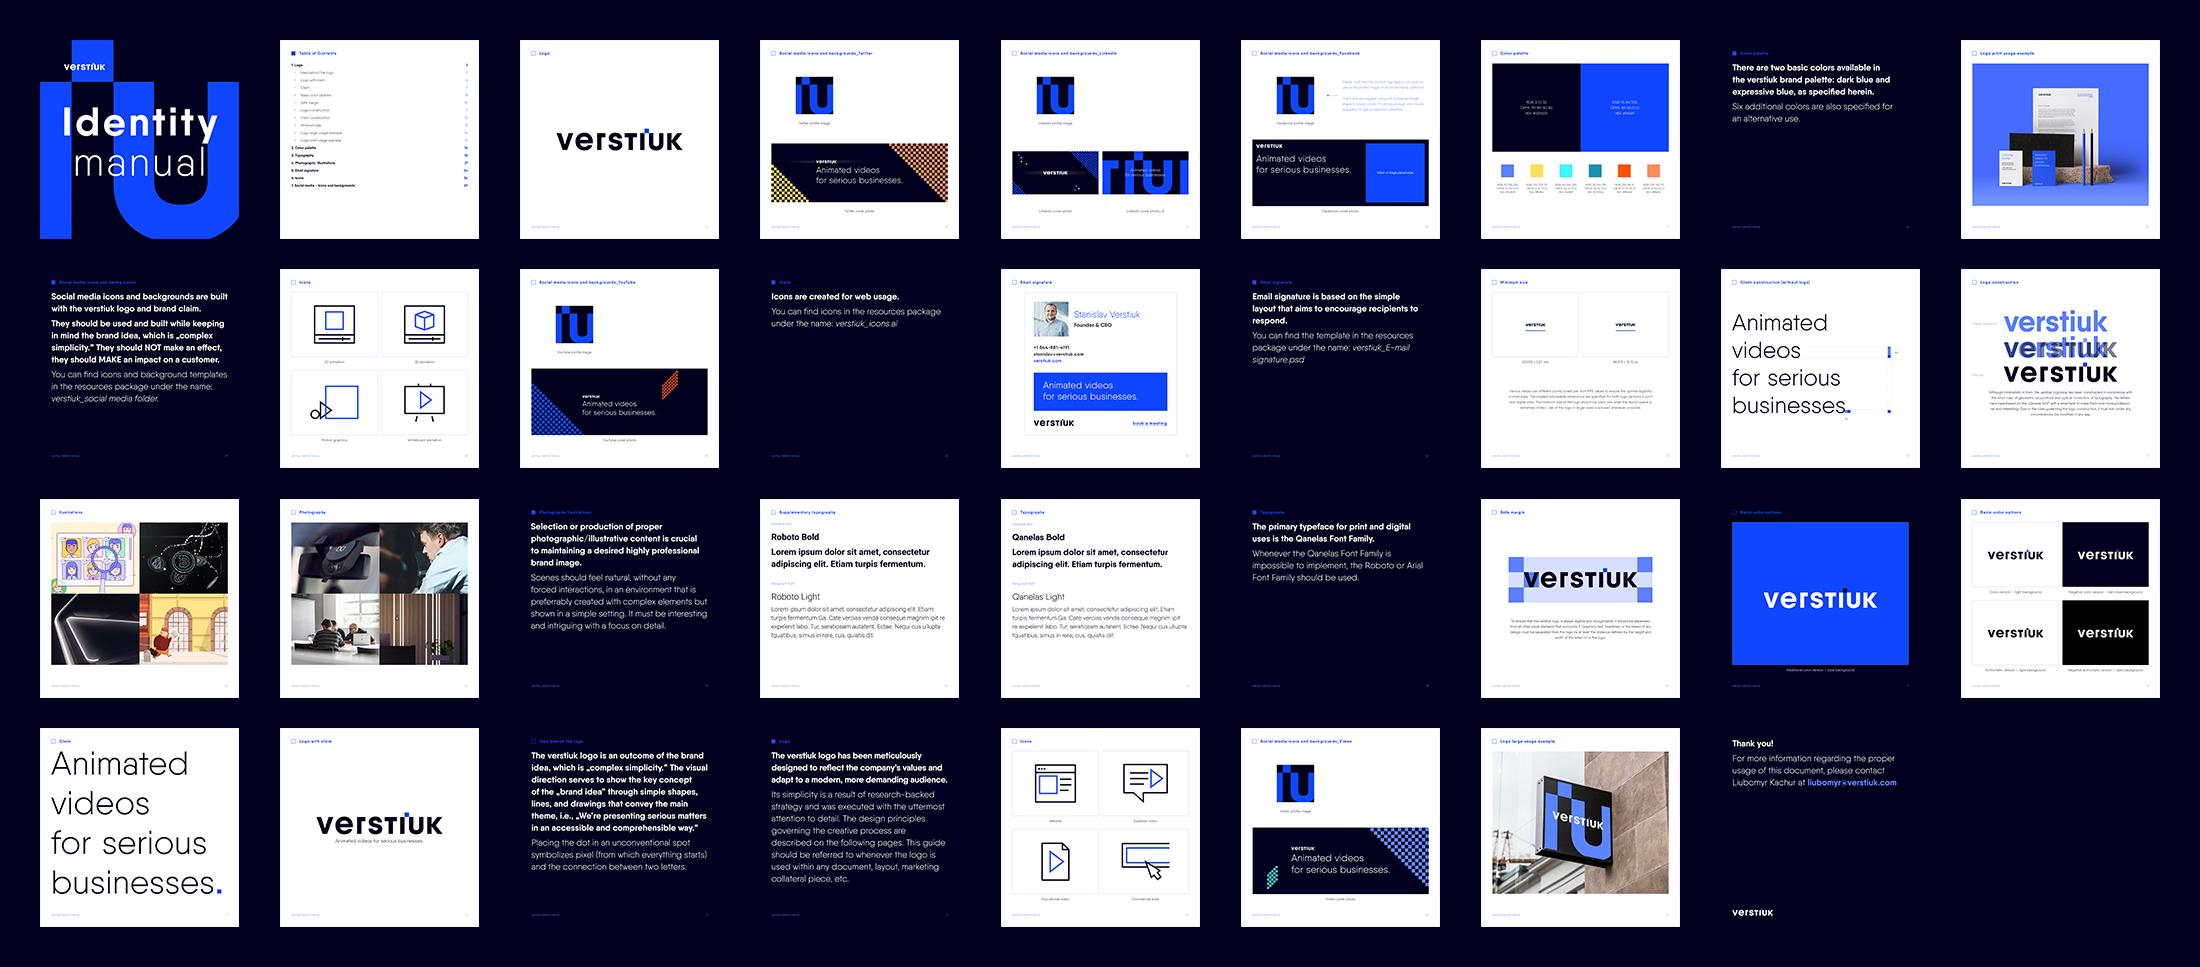 Dawid Koniuszewski Design_Verstiuk_Identity manual